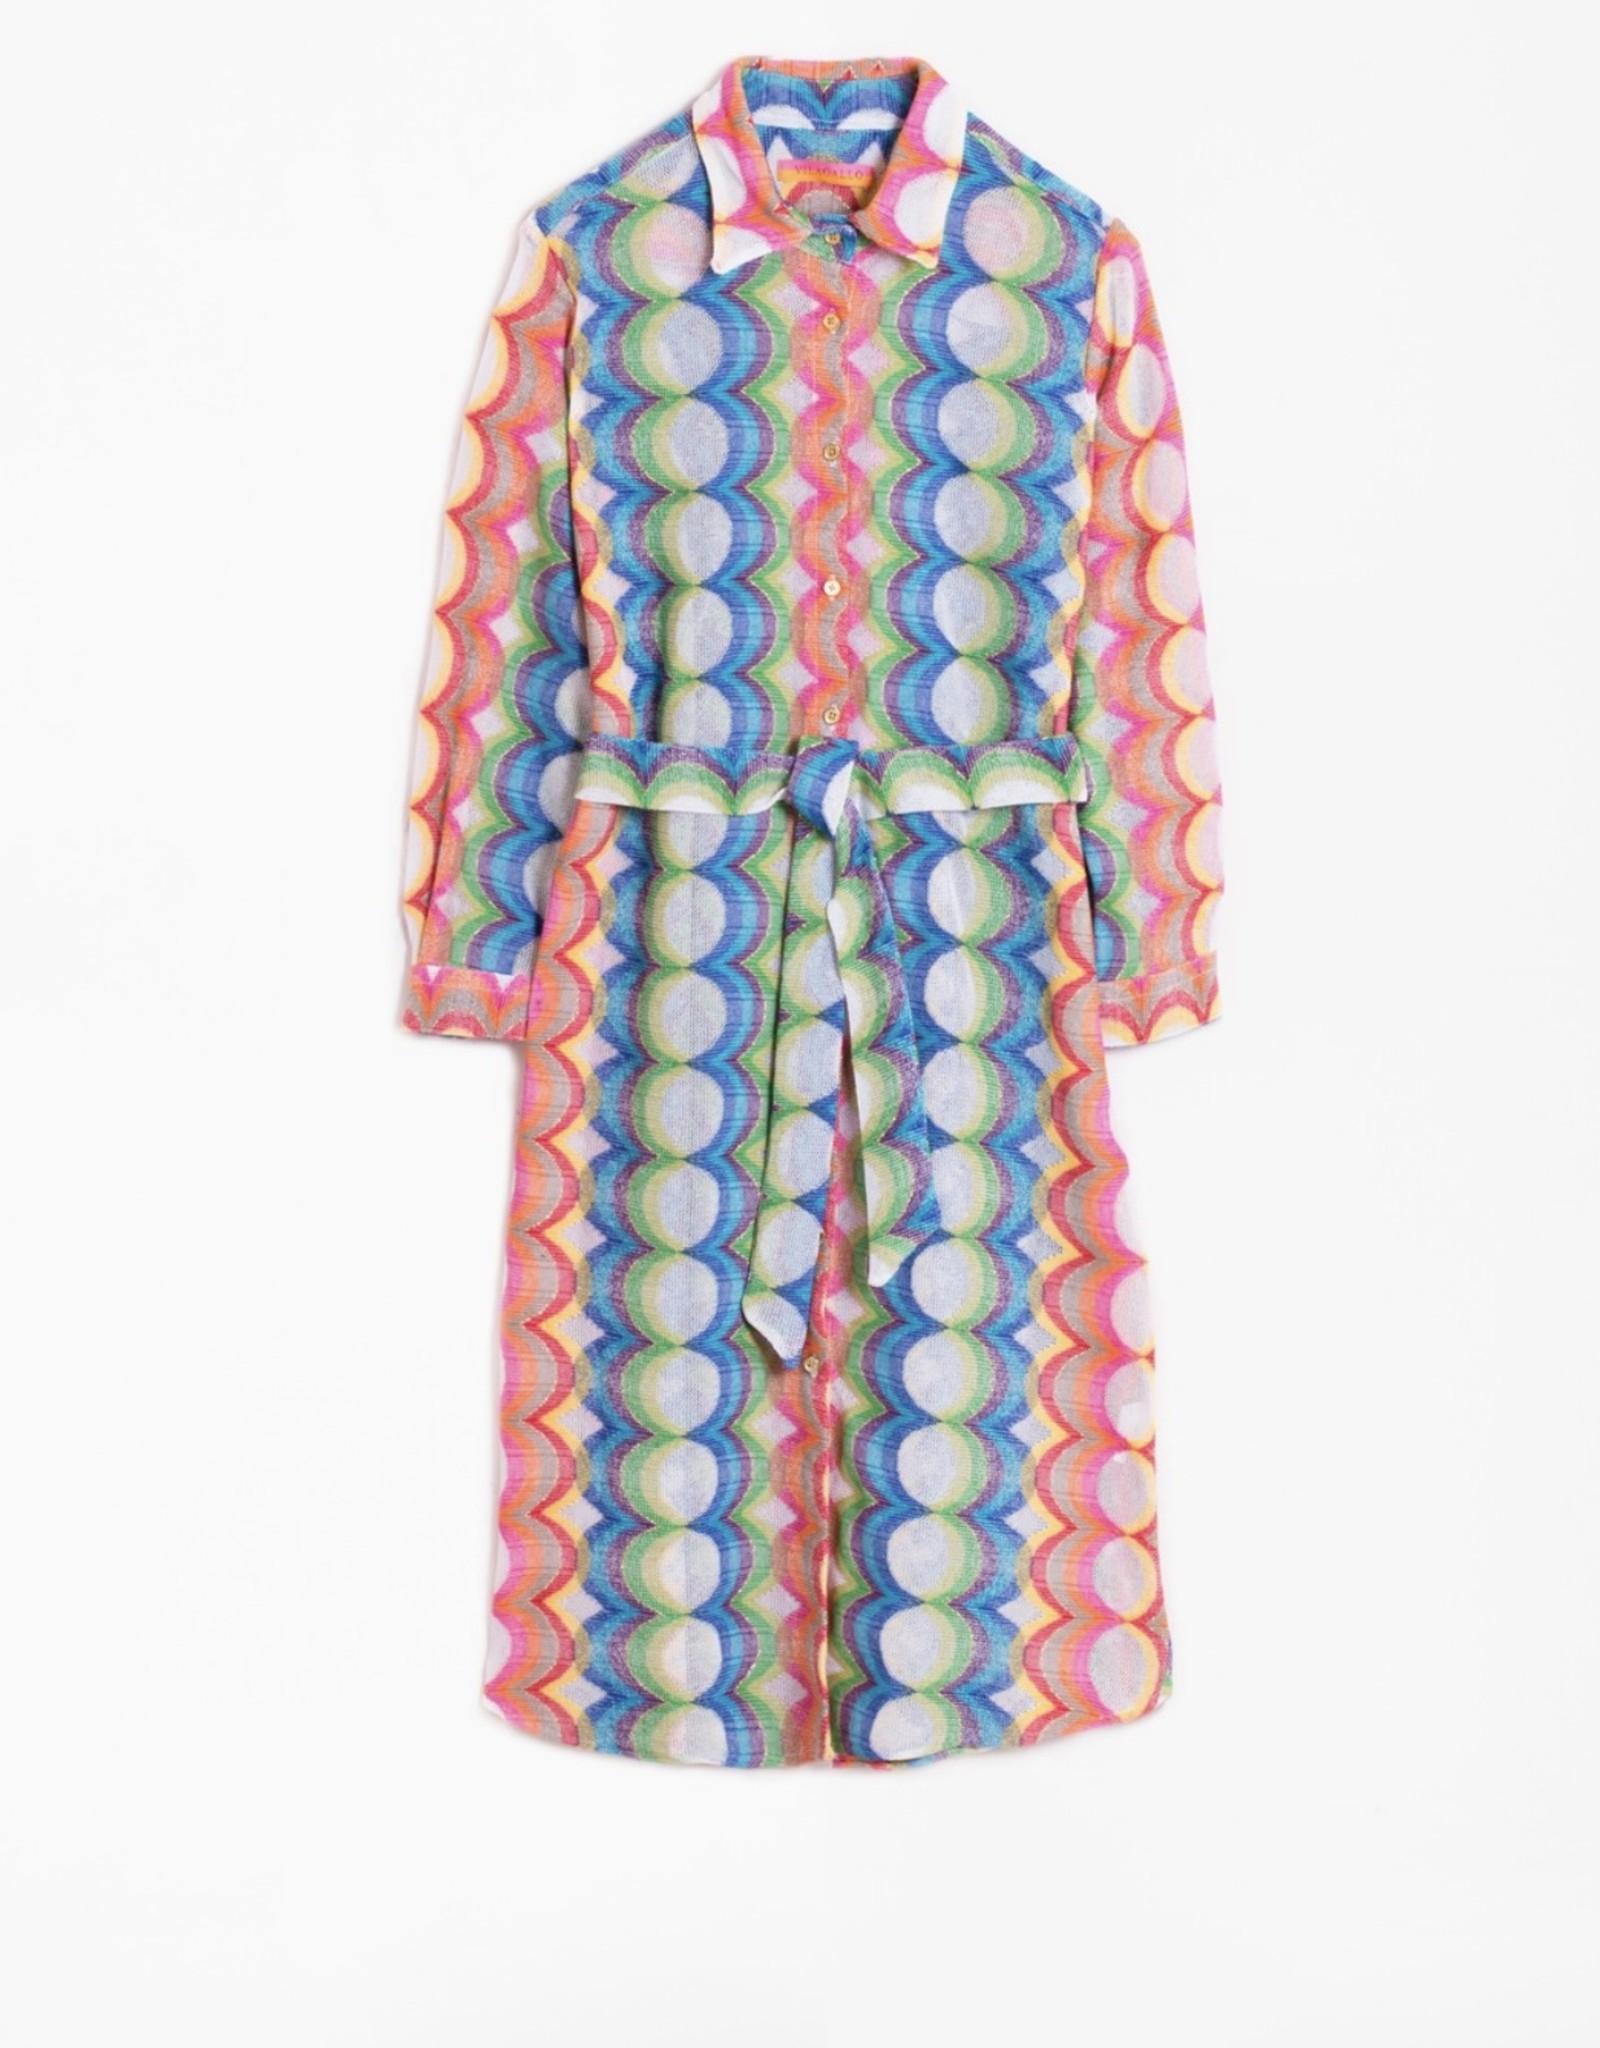 VILAGALLO SHIRT DRESS STYLE = DOVER 28111 VILAGALLO